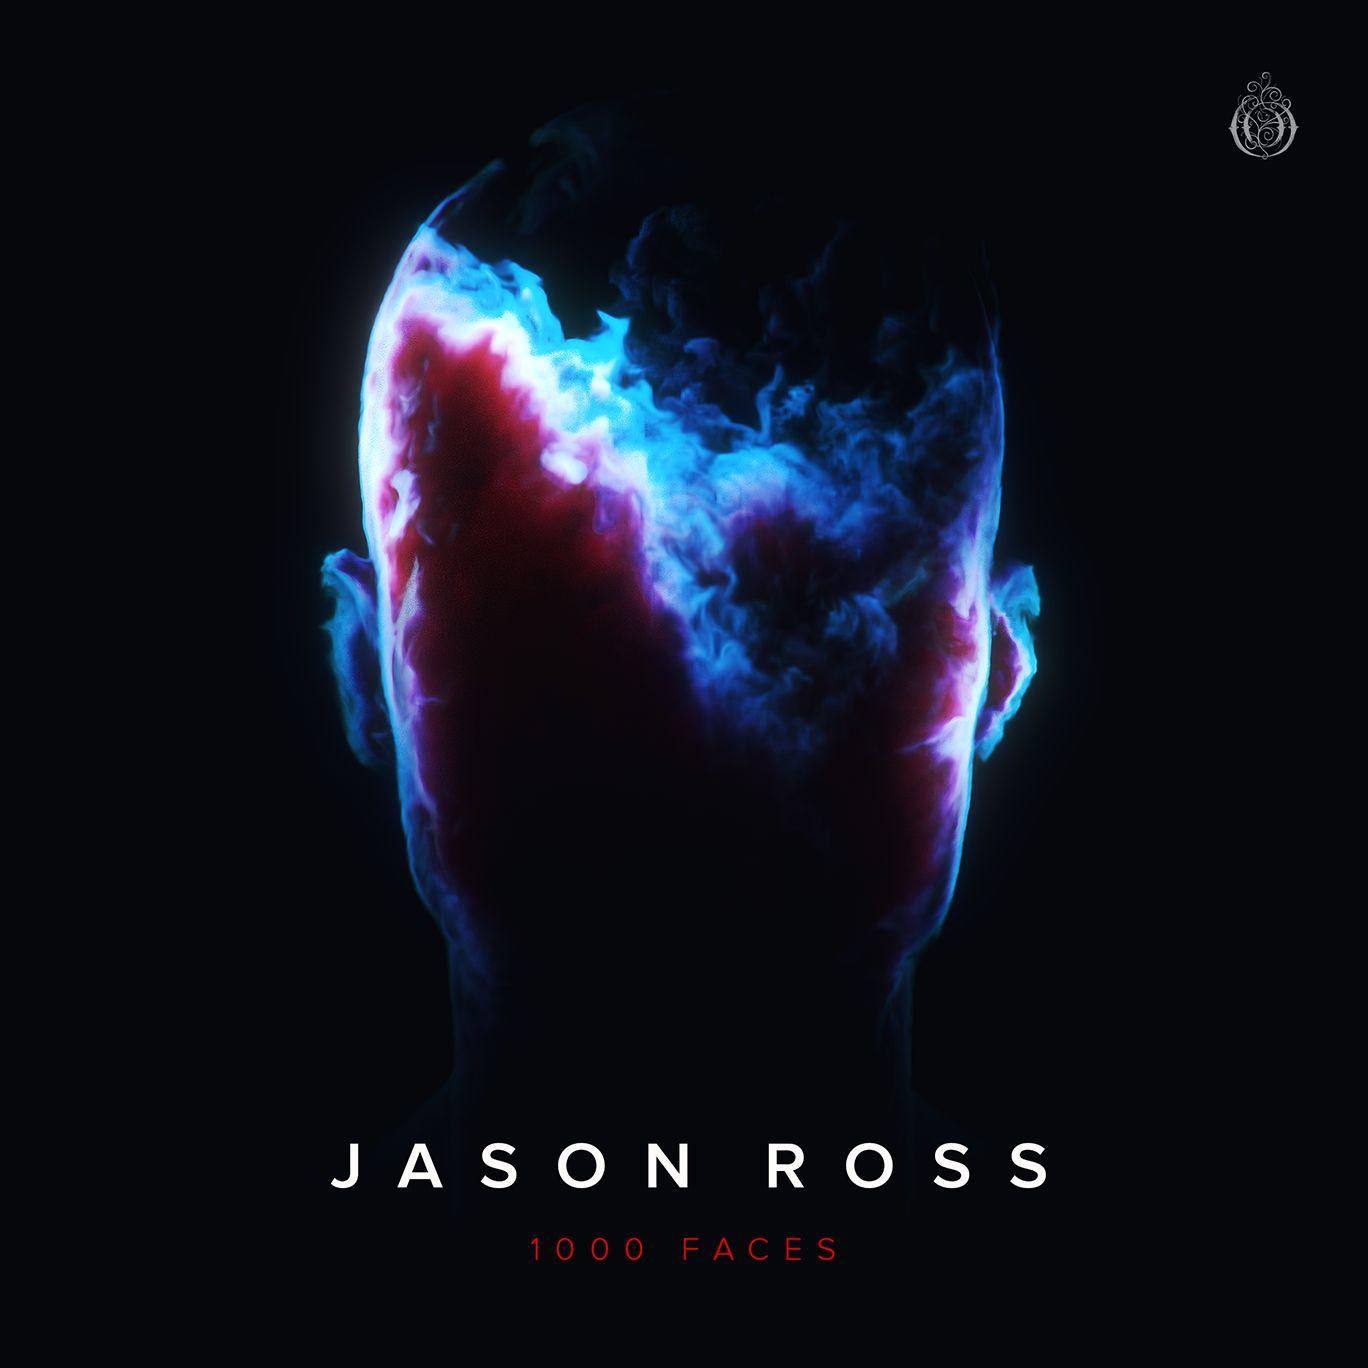 Jason Ross 1000 Faces